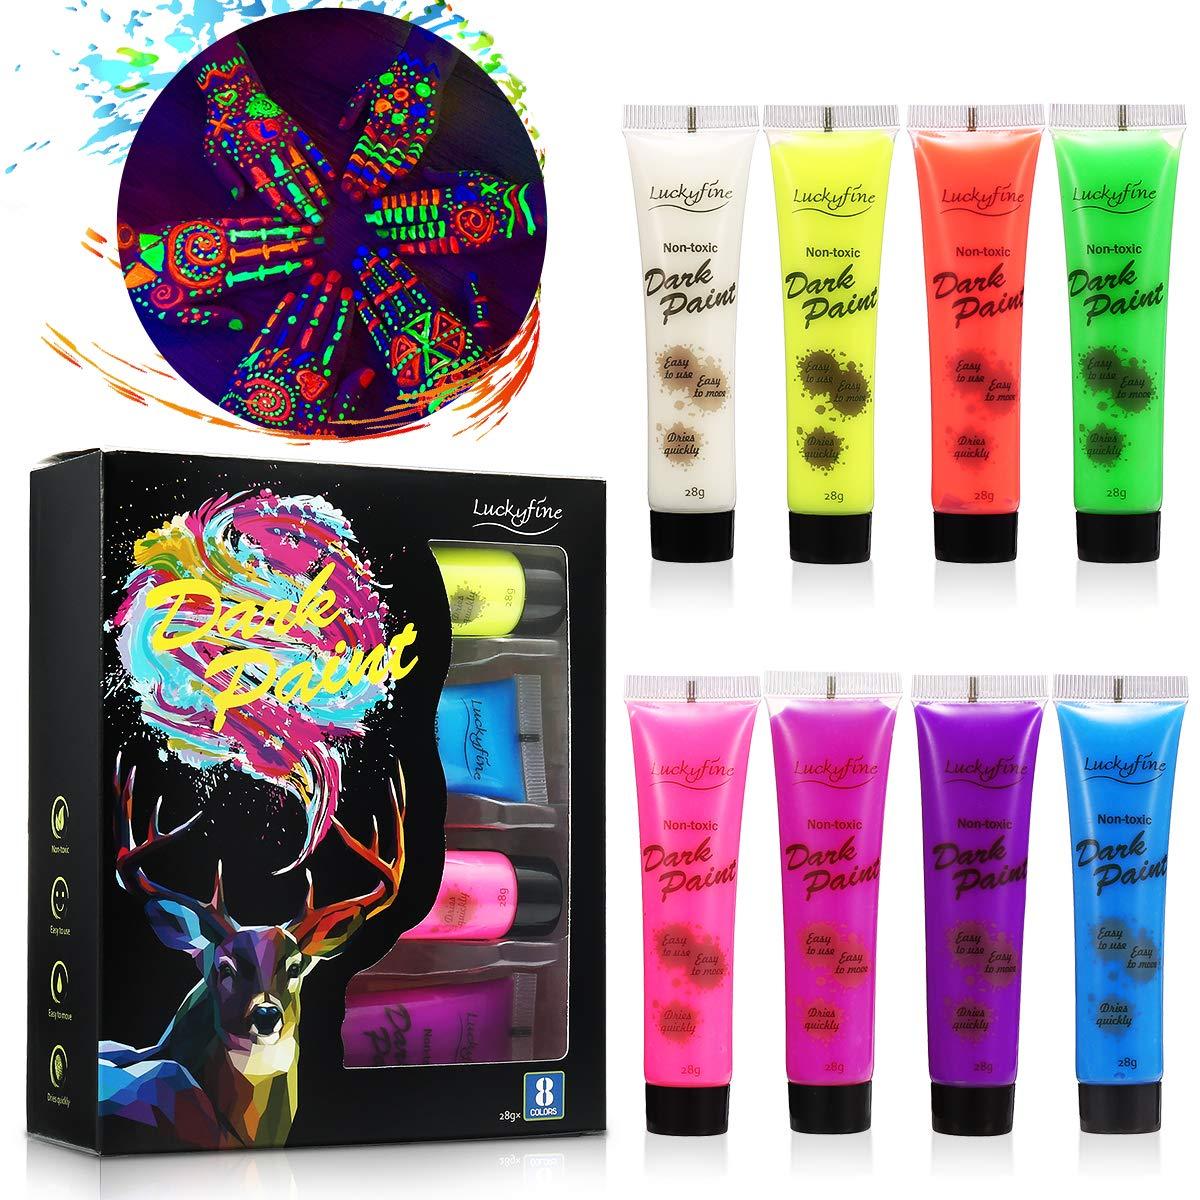 Neon Bodypainting Schminke Set, Luckyfine 8 Farben 28ml Körpermalfarben Kit